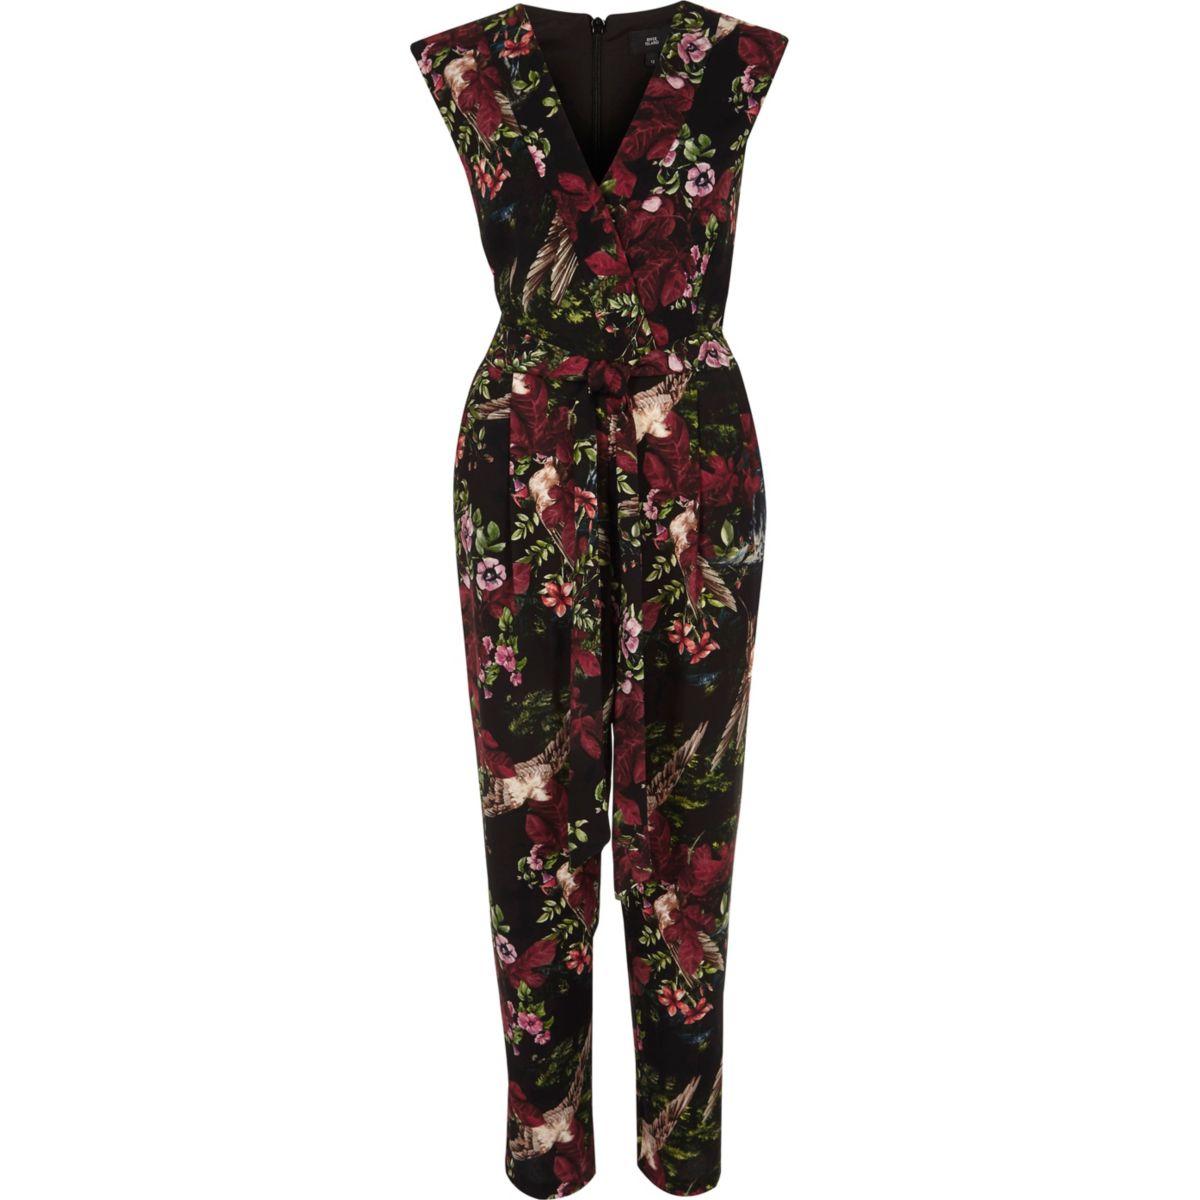 Black floral print tailored jumpsuit